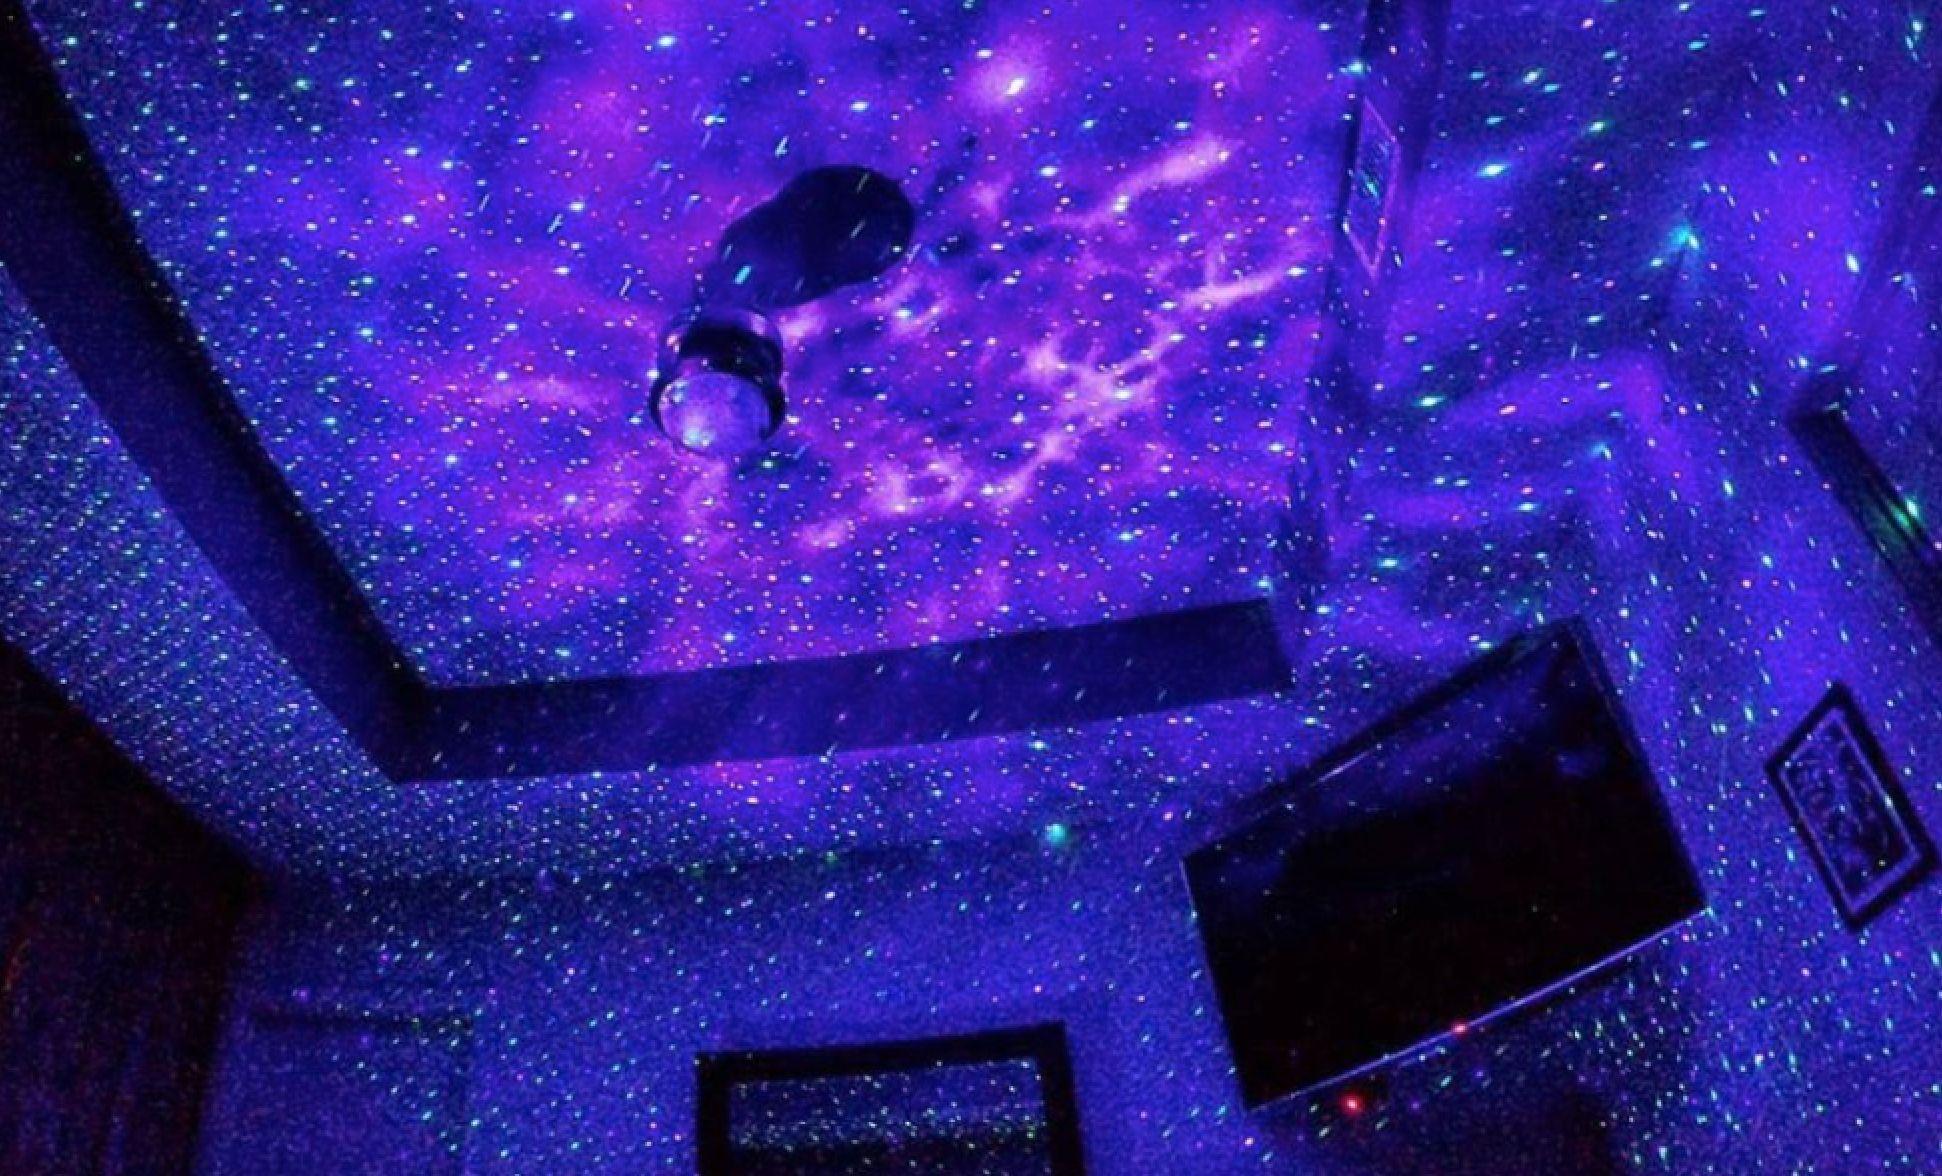 childrens bedroom lighting ideas